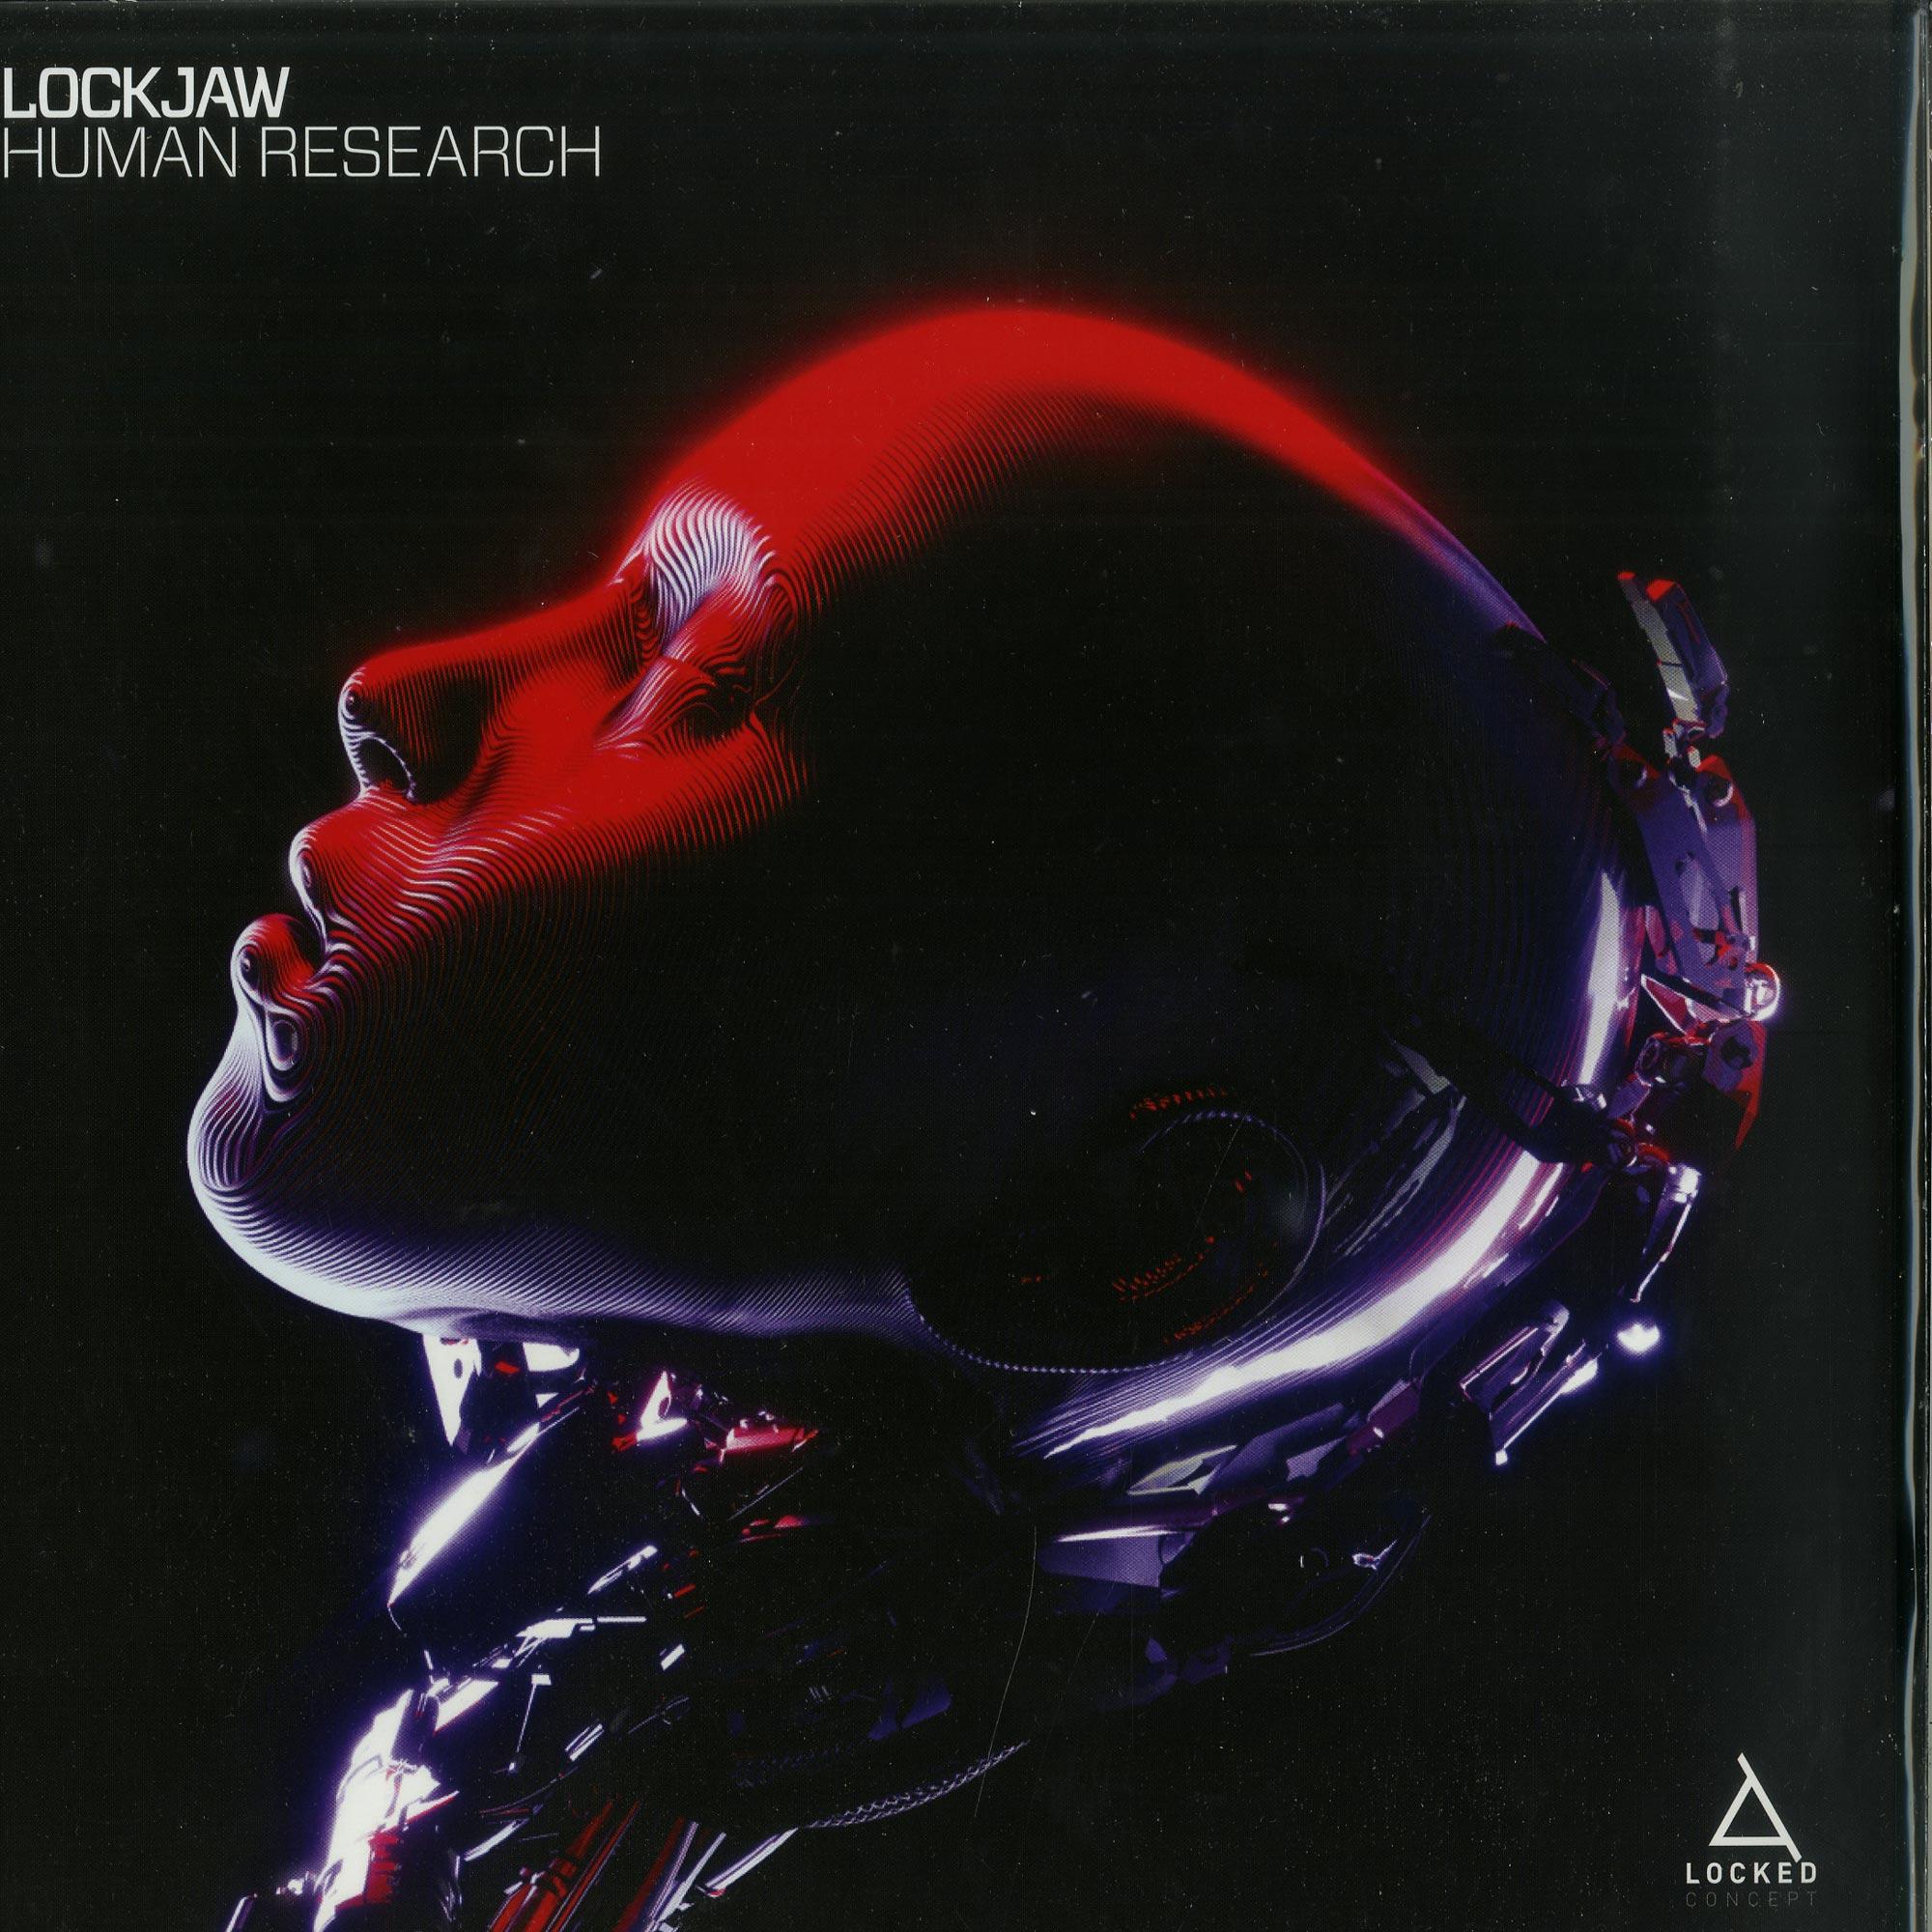 Lockjaw - HUMAN RESEARCH LP SAMPLER